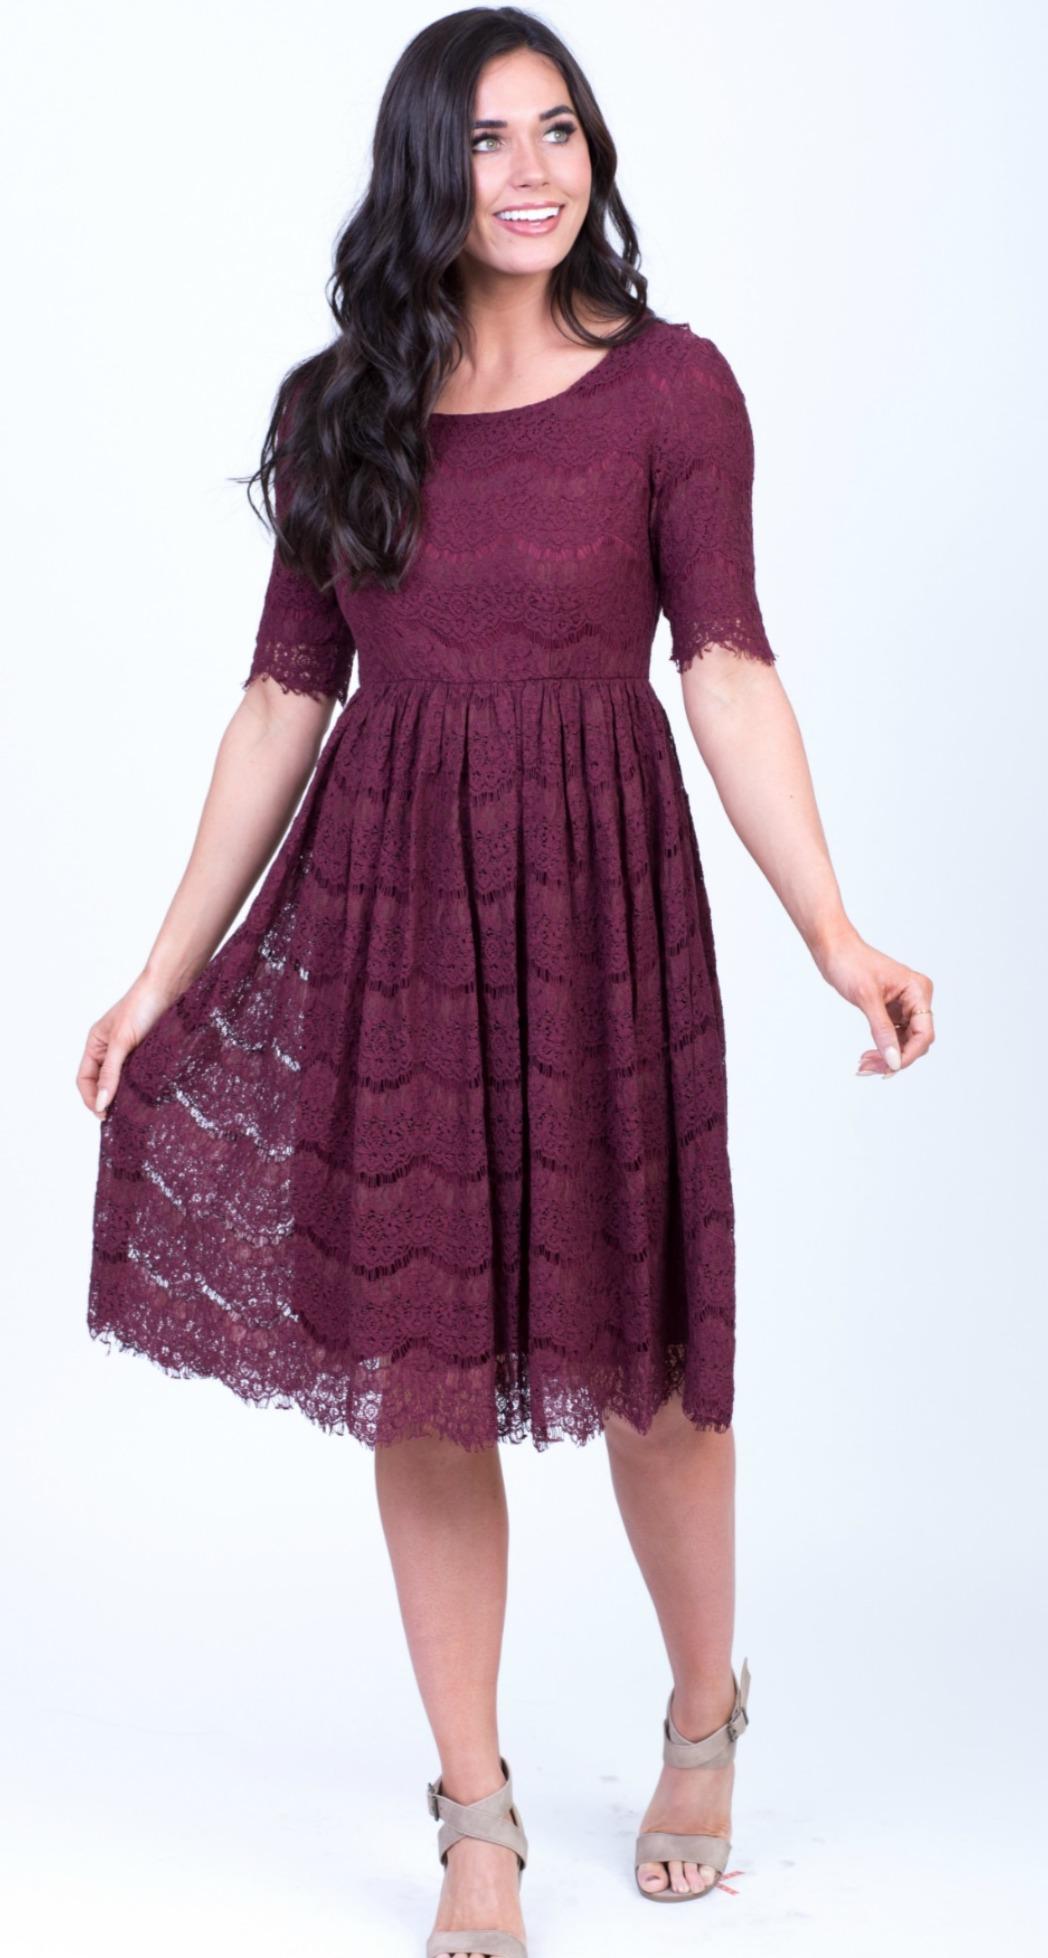 Evelyn Lace Dress-Burgundy